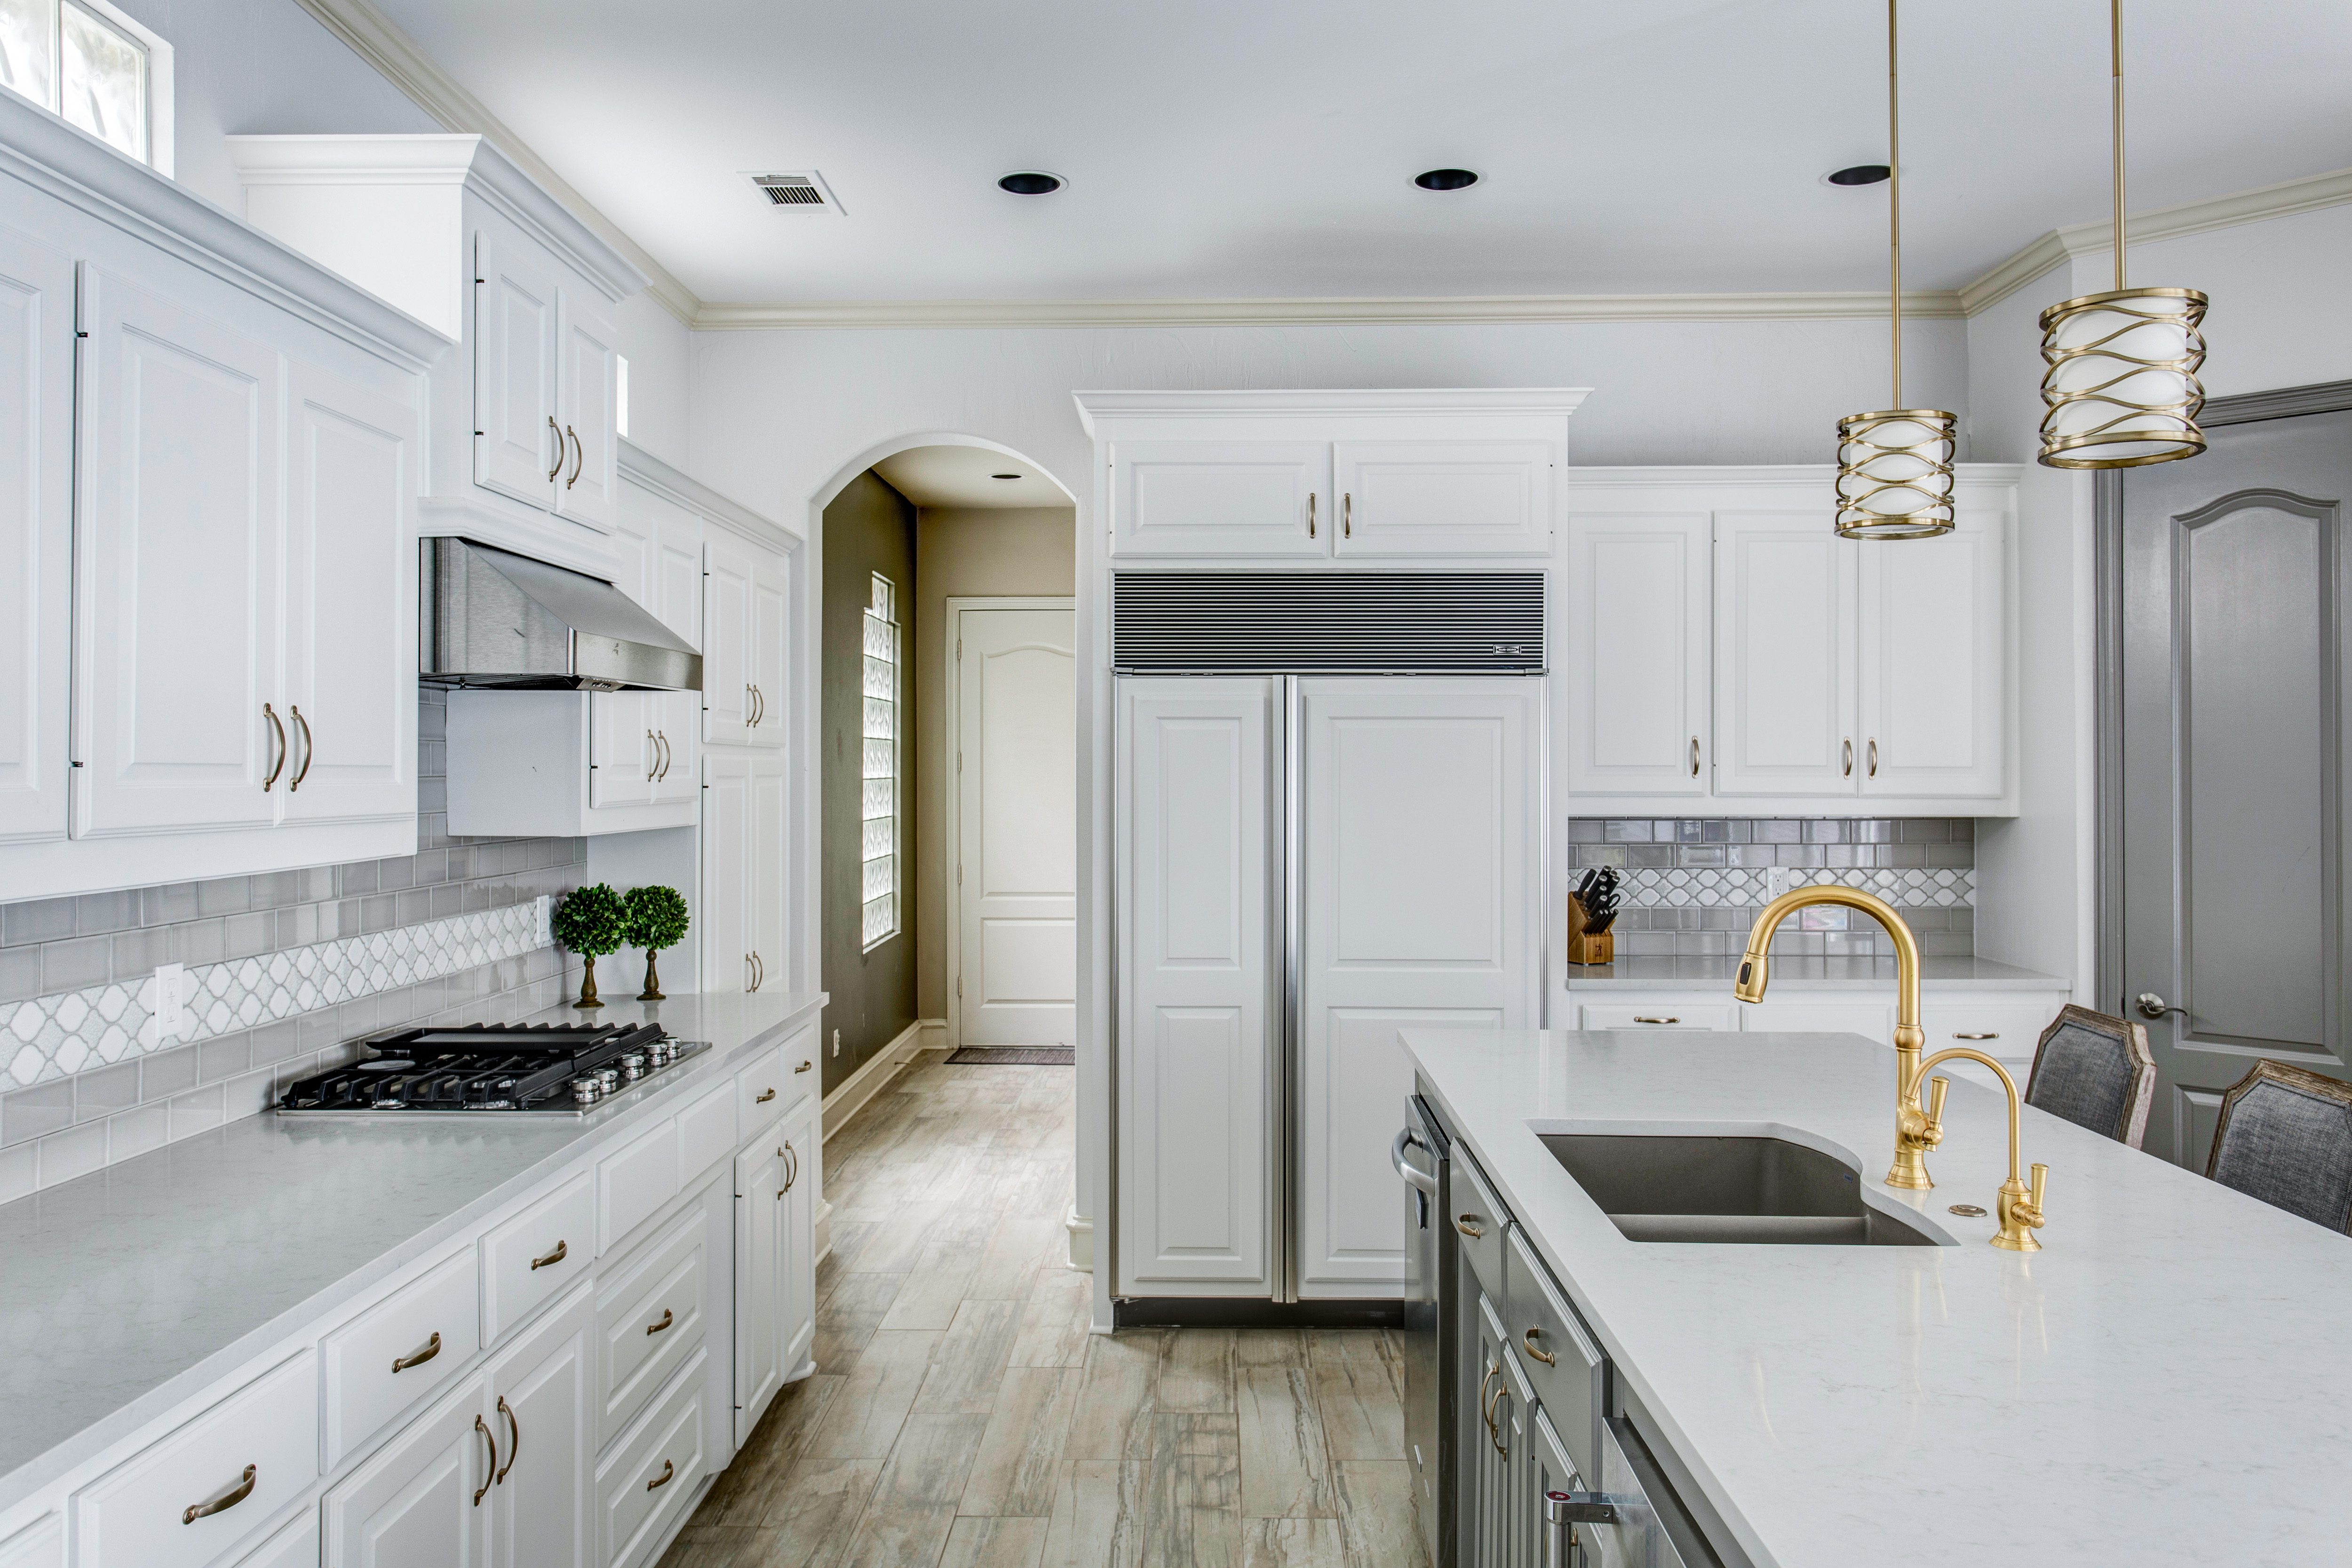 Snappy Kitchens 6322 Gaston Ave Dallas Tx 75214 Yp Com